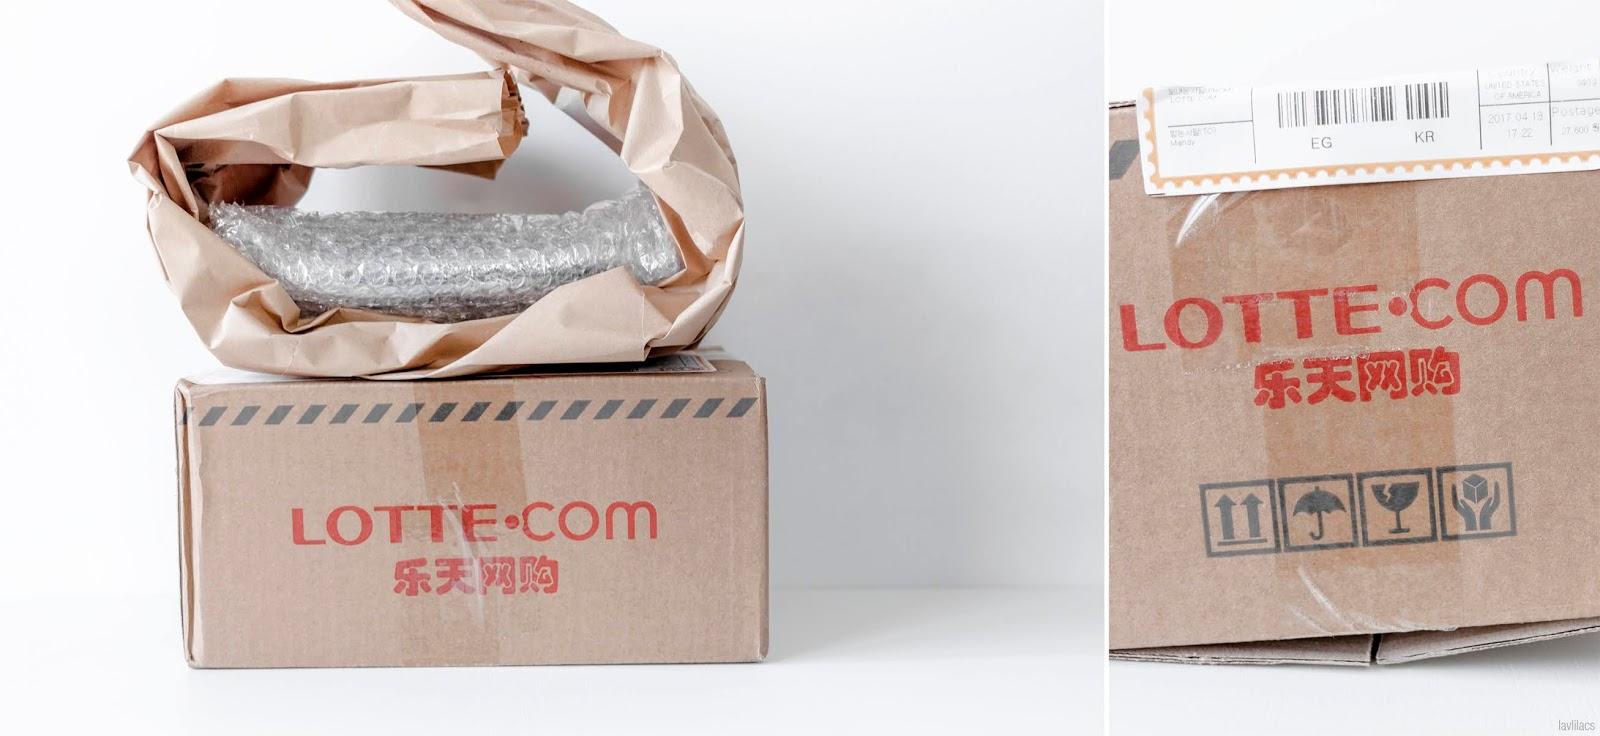 lavlilacs April 2017 haul - Global Lotte EMS packaging